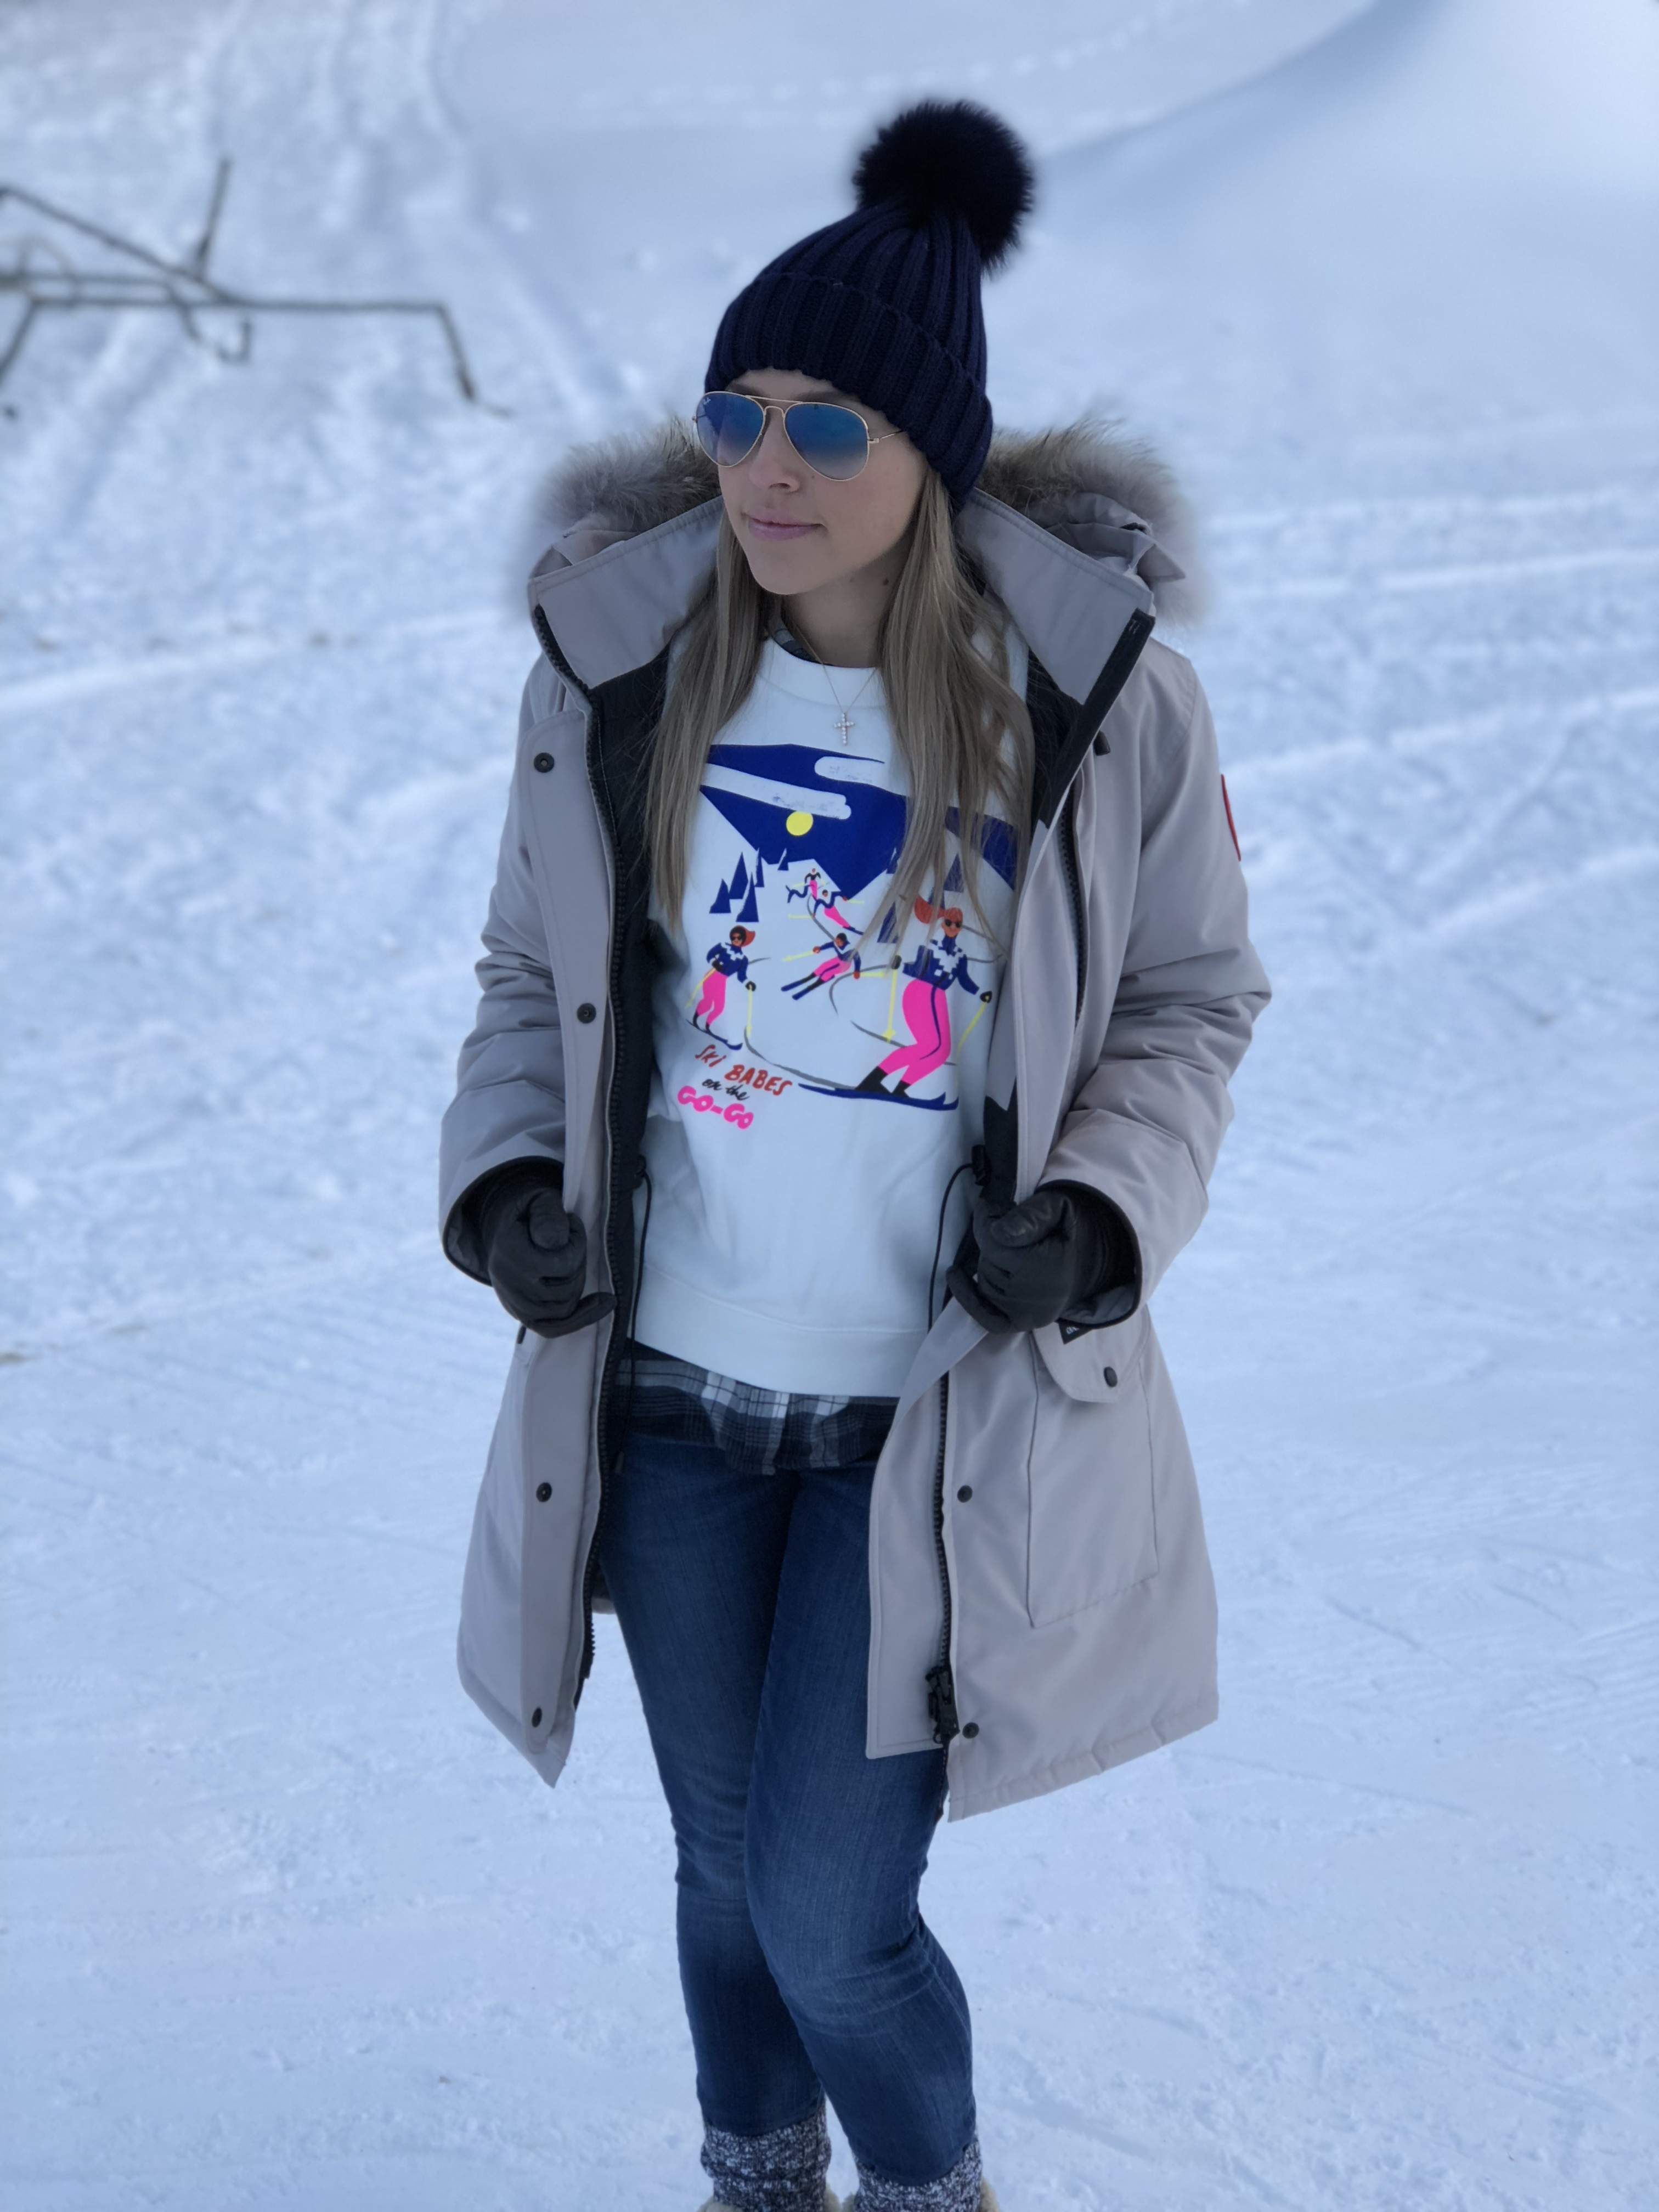 THELMA: We Love Them Snow Bunnies!